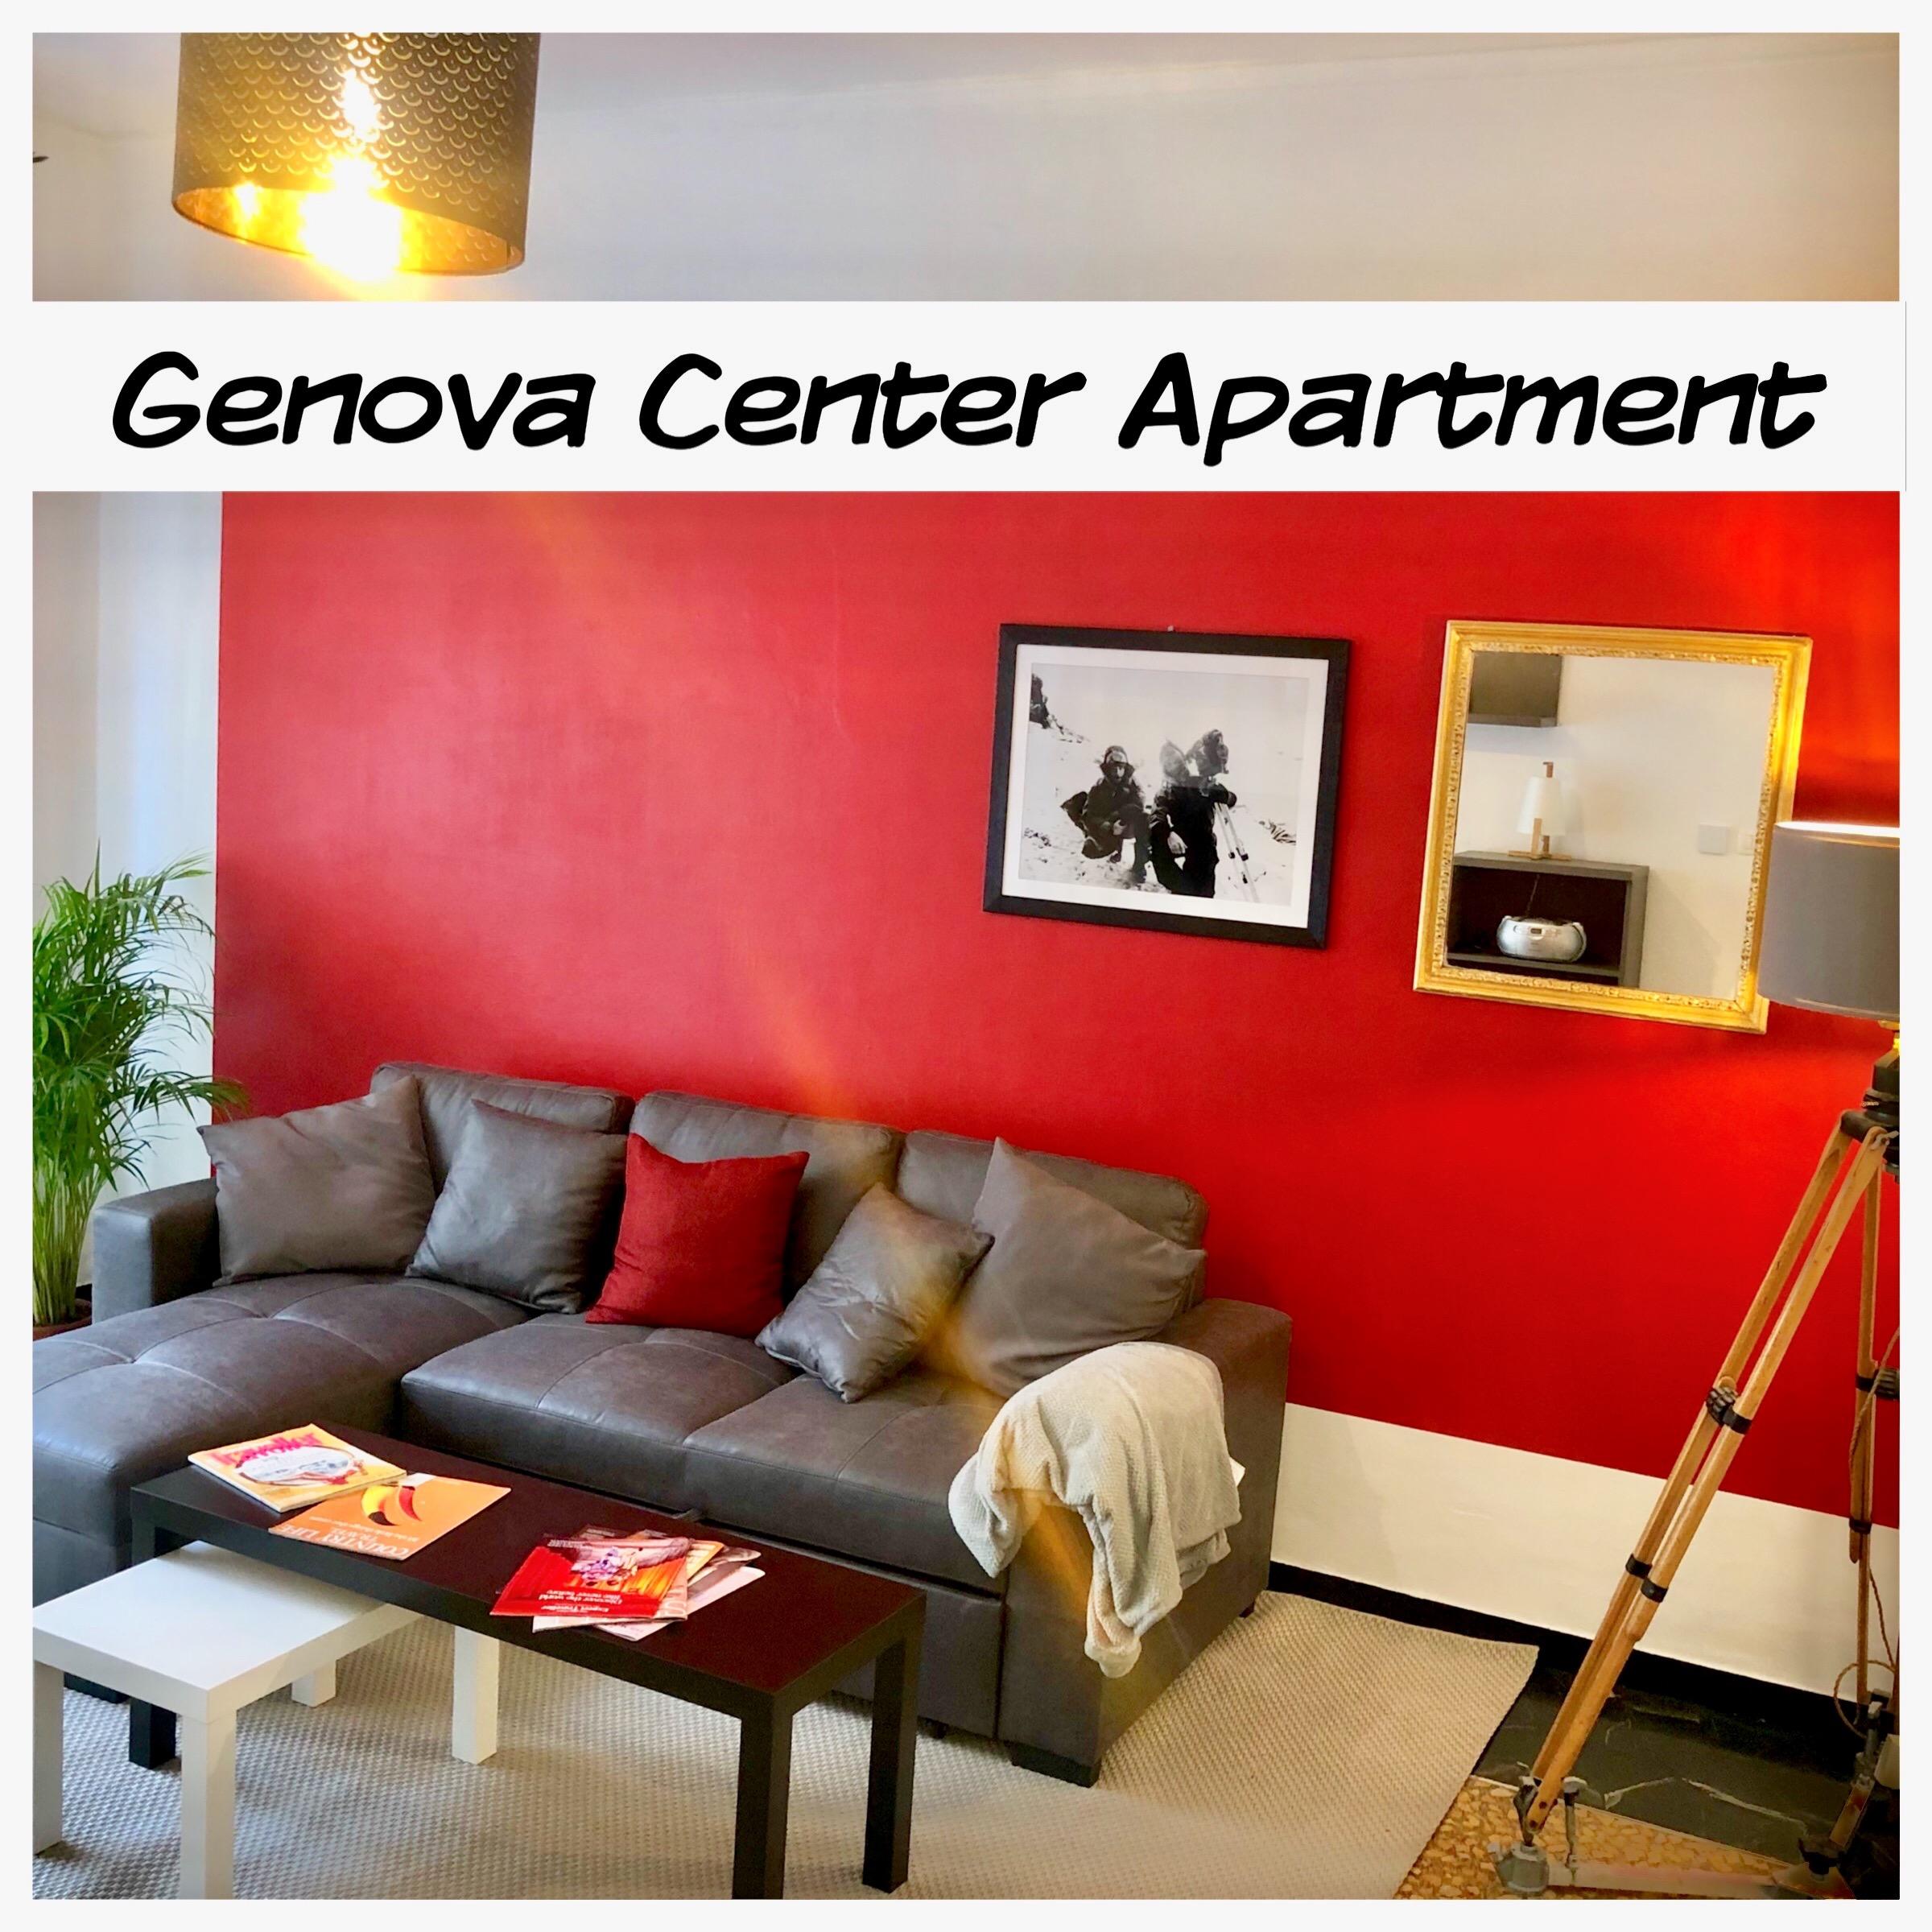 Genova Center Apartment - San Martino